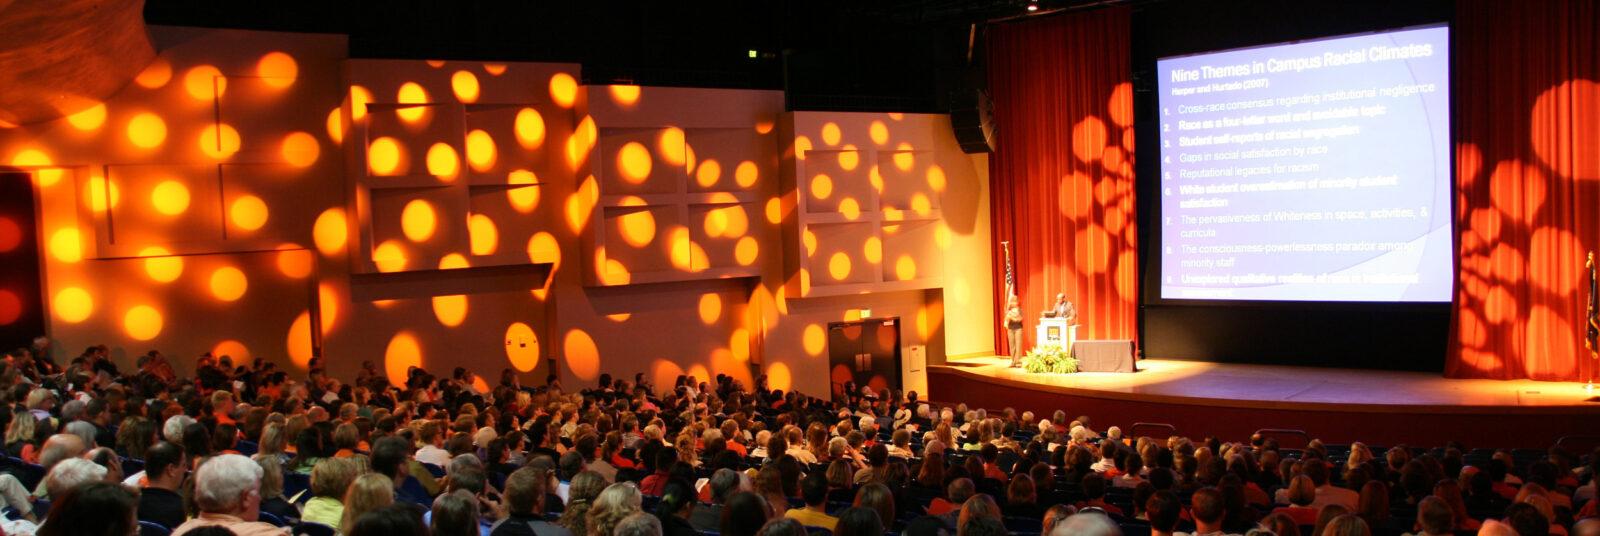 Participation in scientific events